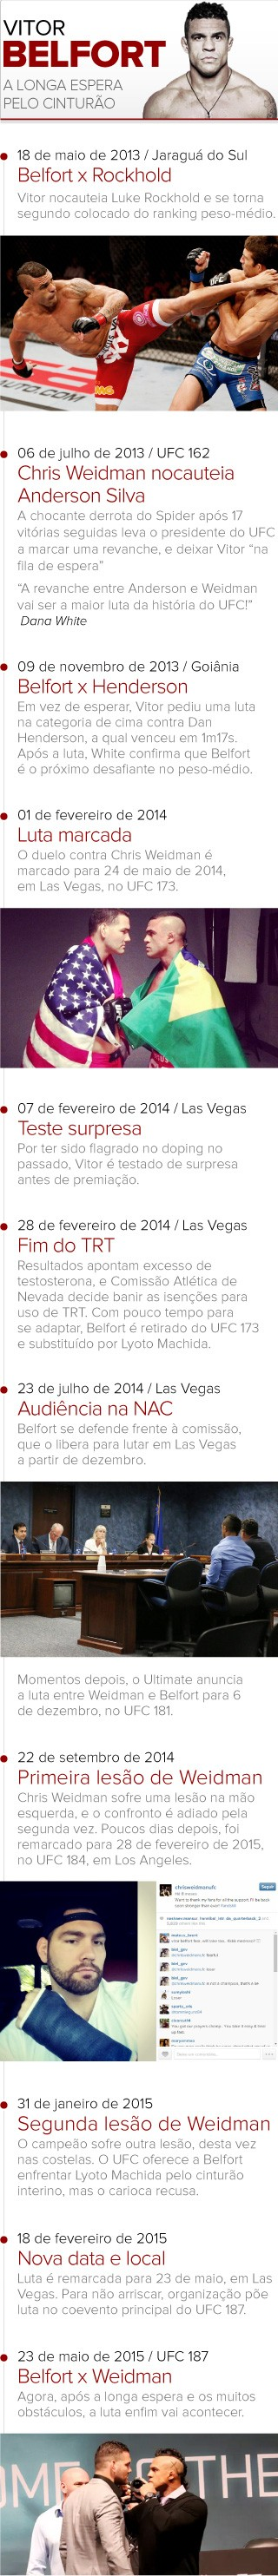 Info TIME LINE Vitor Belfort (Foto: infoesporte)